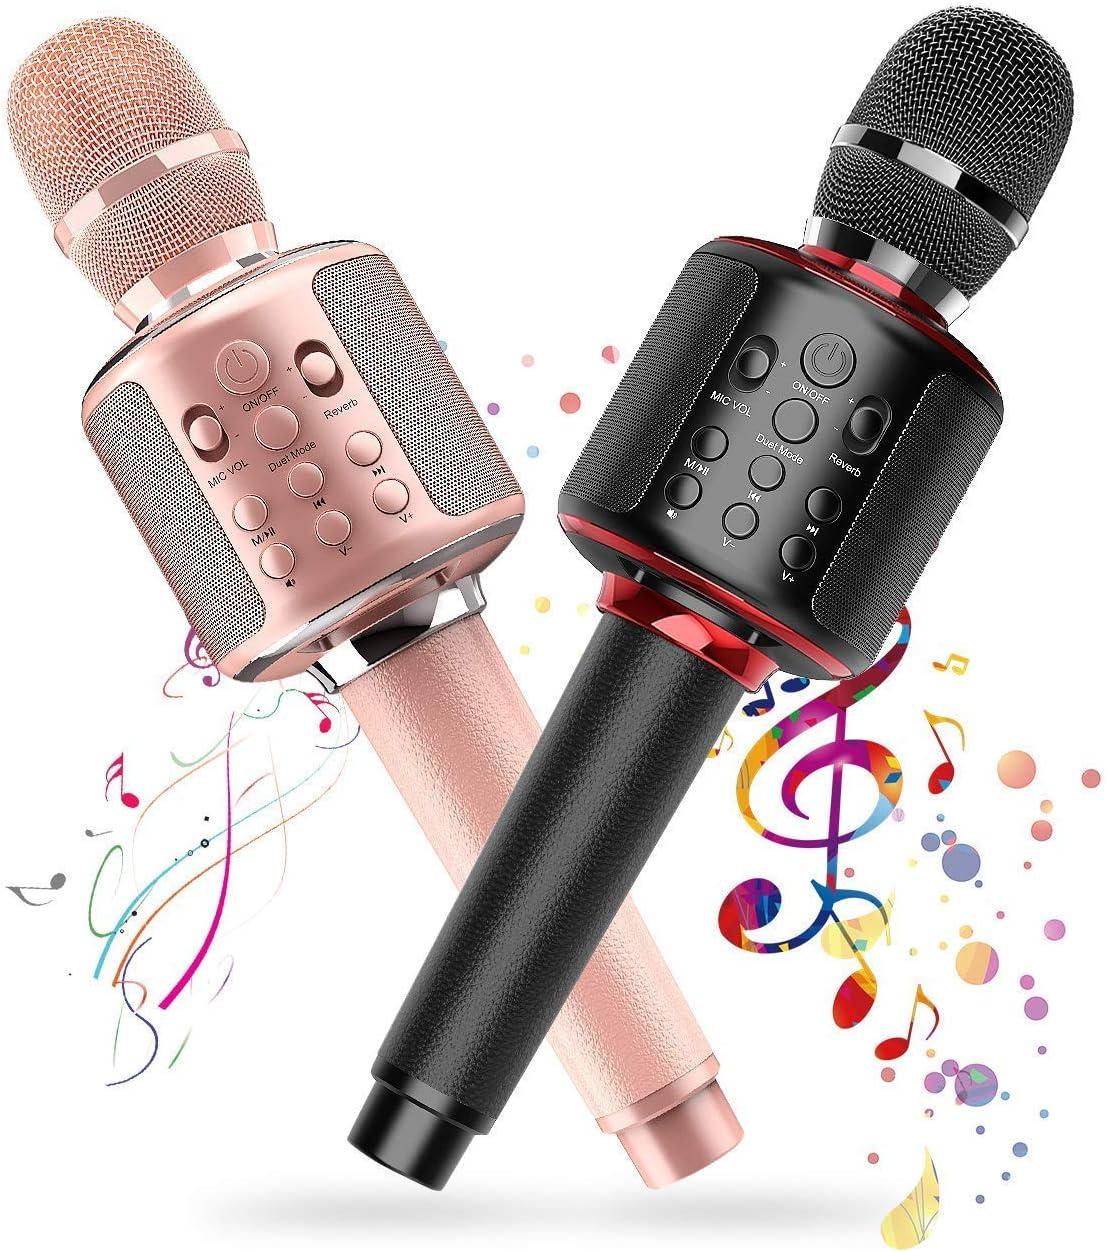 Dual Wireless Bluetooth Karaoke Microphones with Solo/Duet Karaoke Mics, 4 in 1 Portable Handheld Karaoke Singing Built-in 3000mah Rechargeable Machine Speaker, Christmas Birthday Party